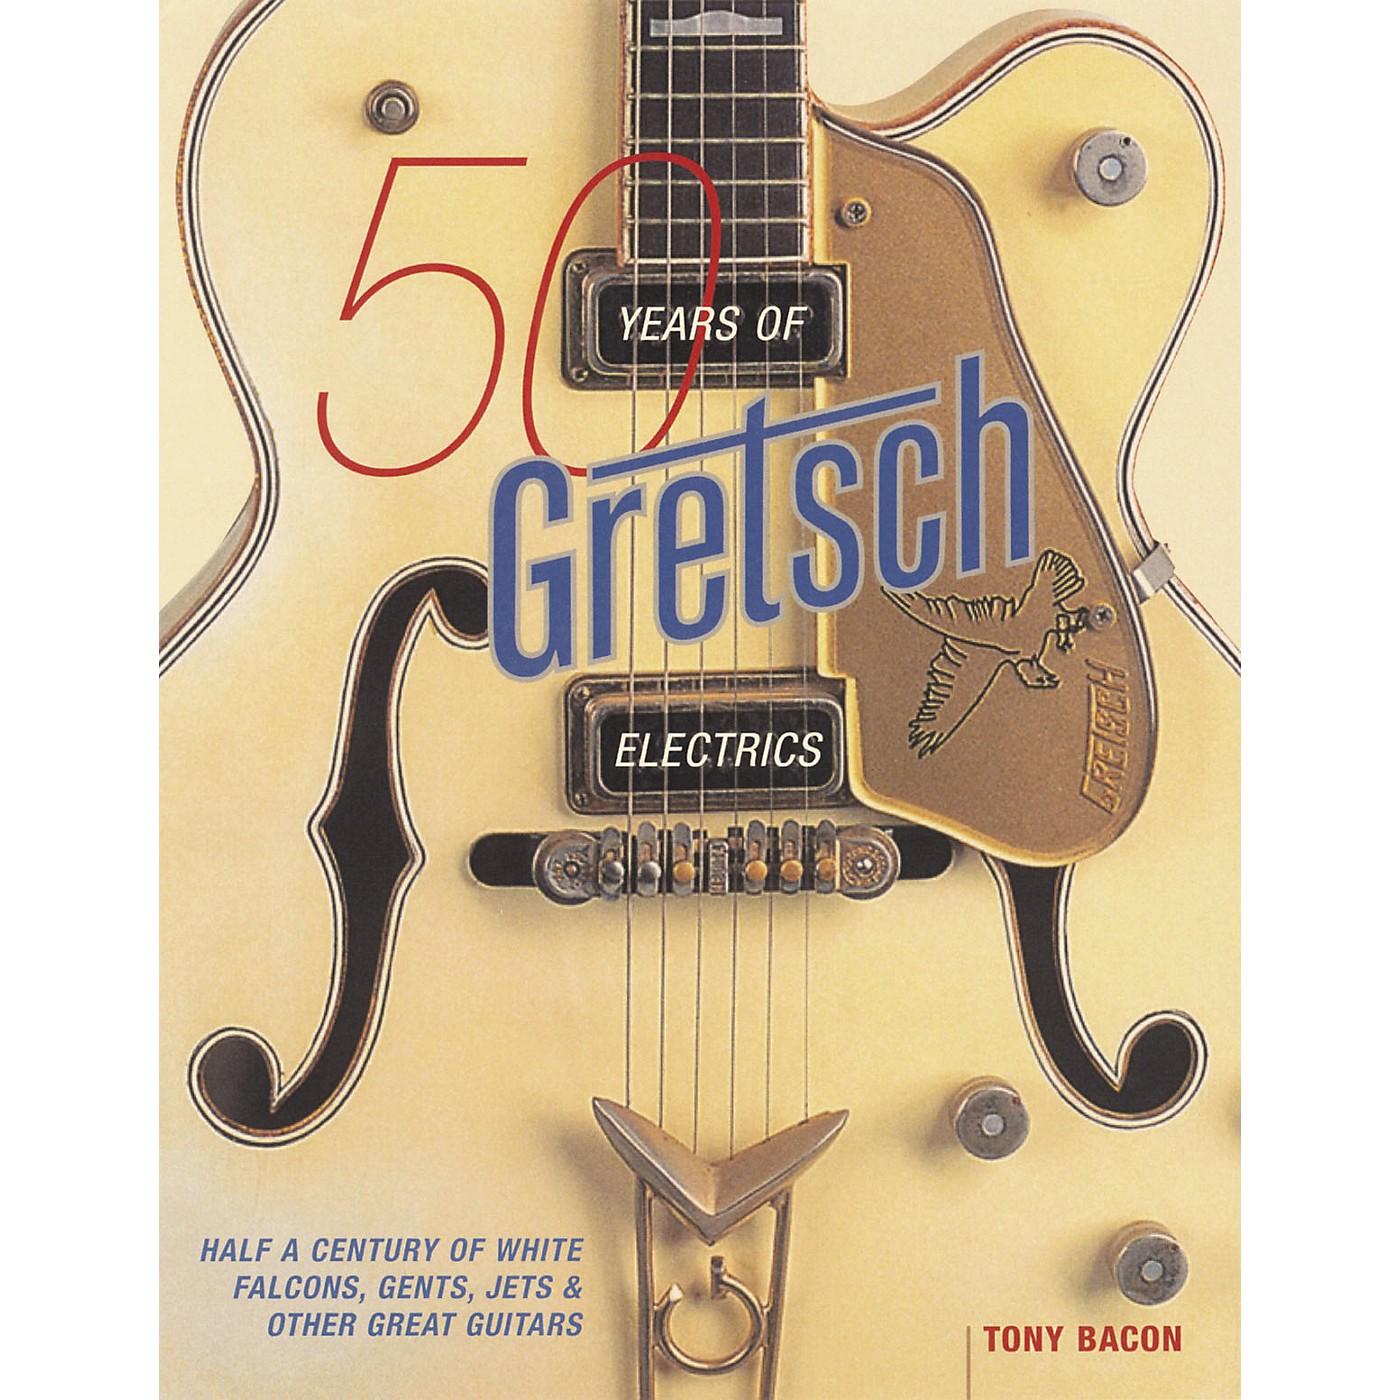 Hal Leonard 50 Years of Gretsch Electrics Book thumbnail